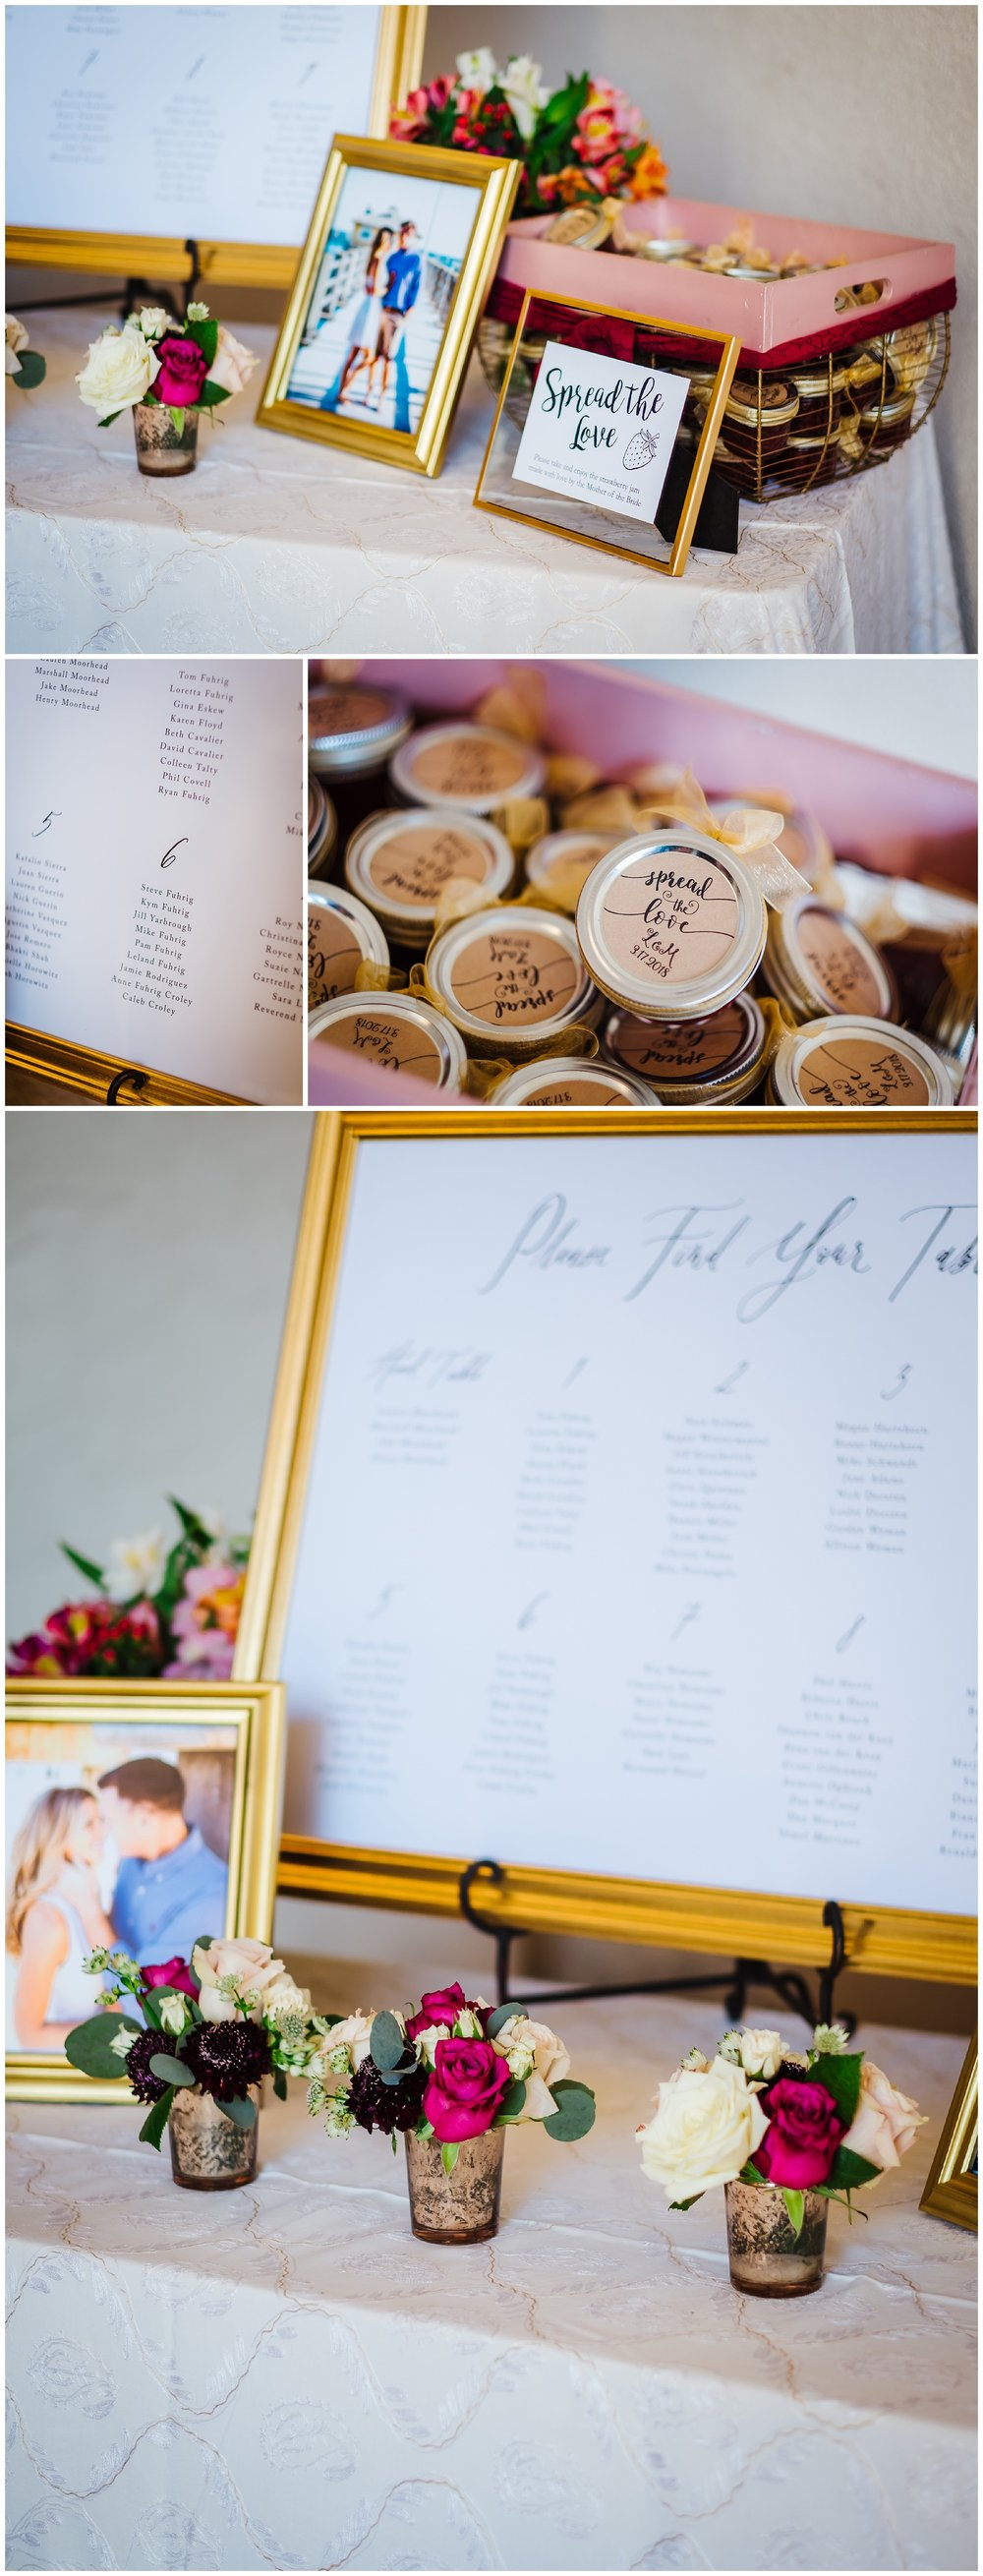 tampa-bradenton-wedding-photographer-south-florida-museum-classic-blush-gold-alpacas-sparklers_0061.jpg